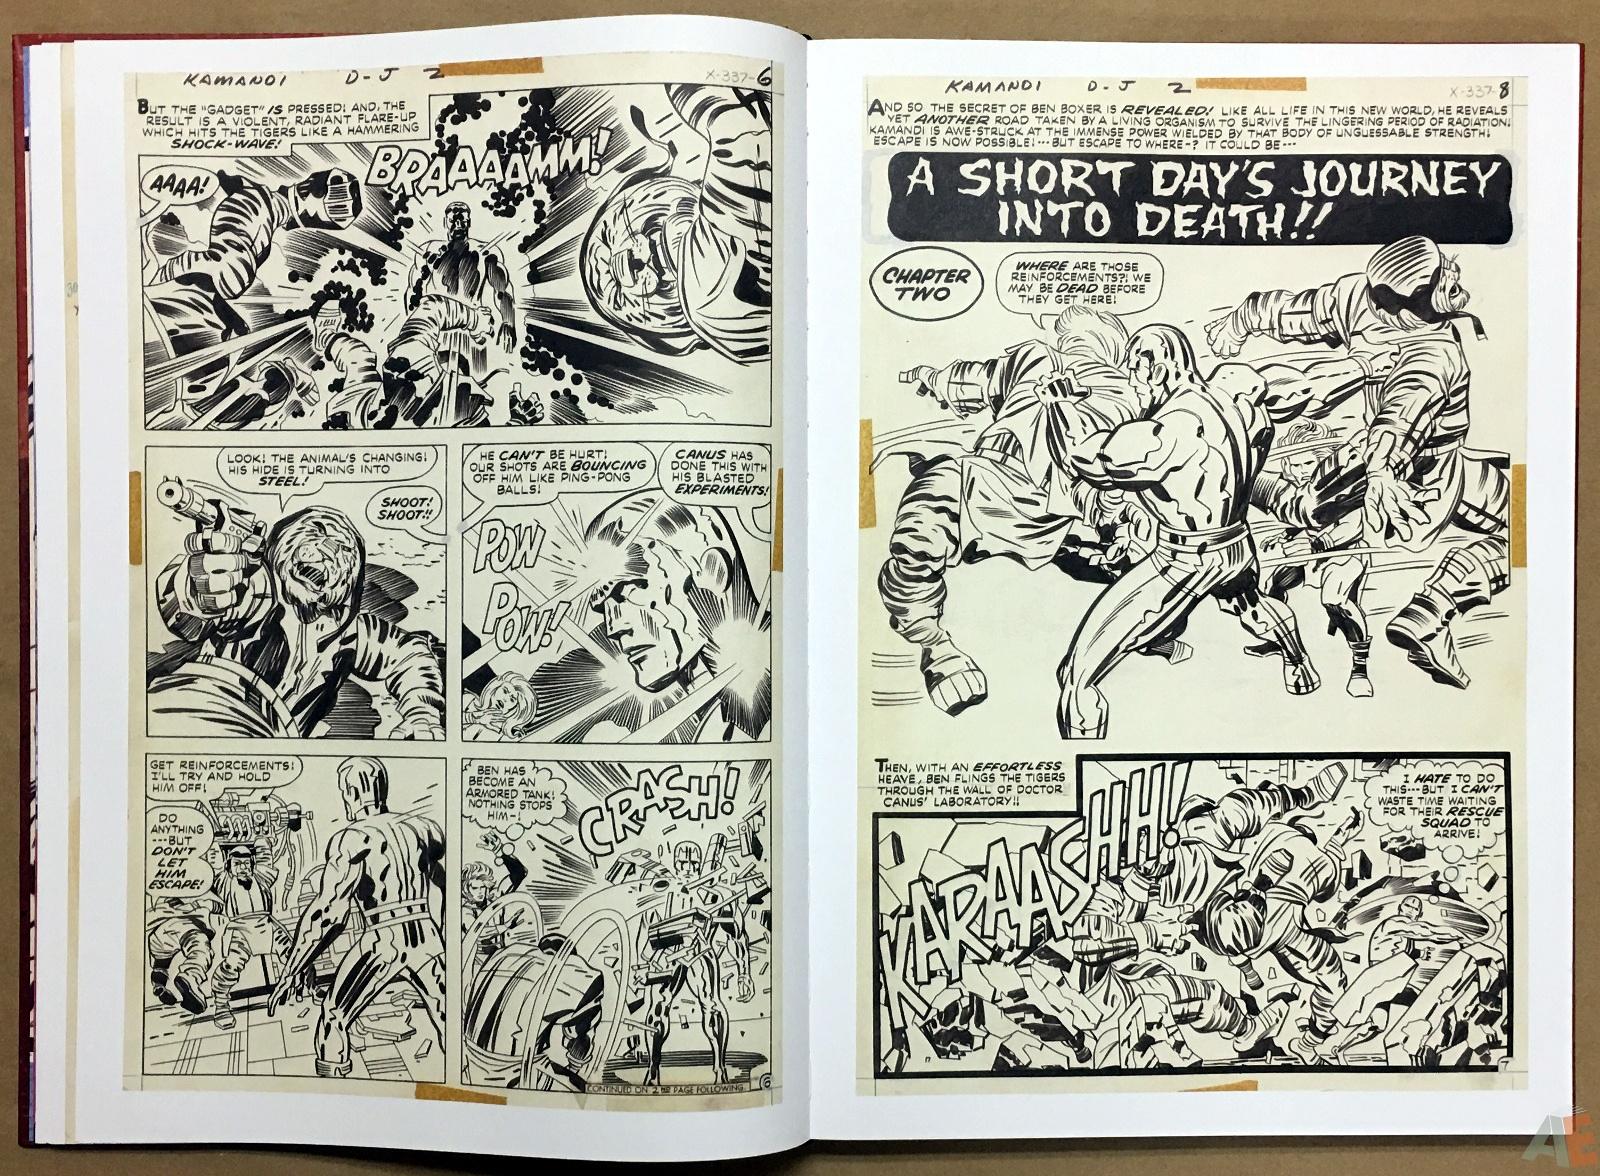 Jack Kirby Kamandi The Last Boy On Earth Artist's Edition 16